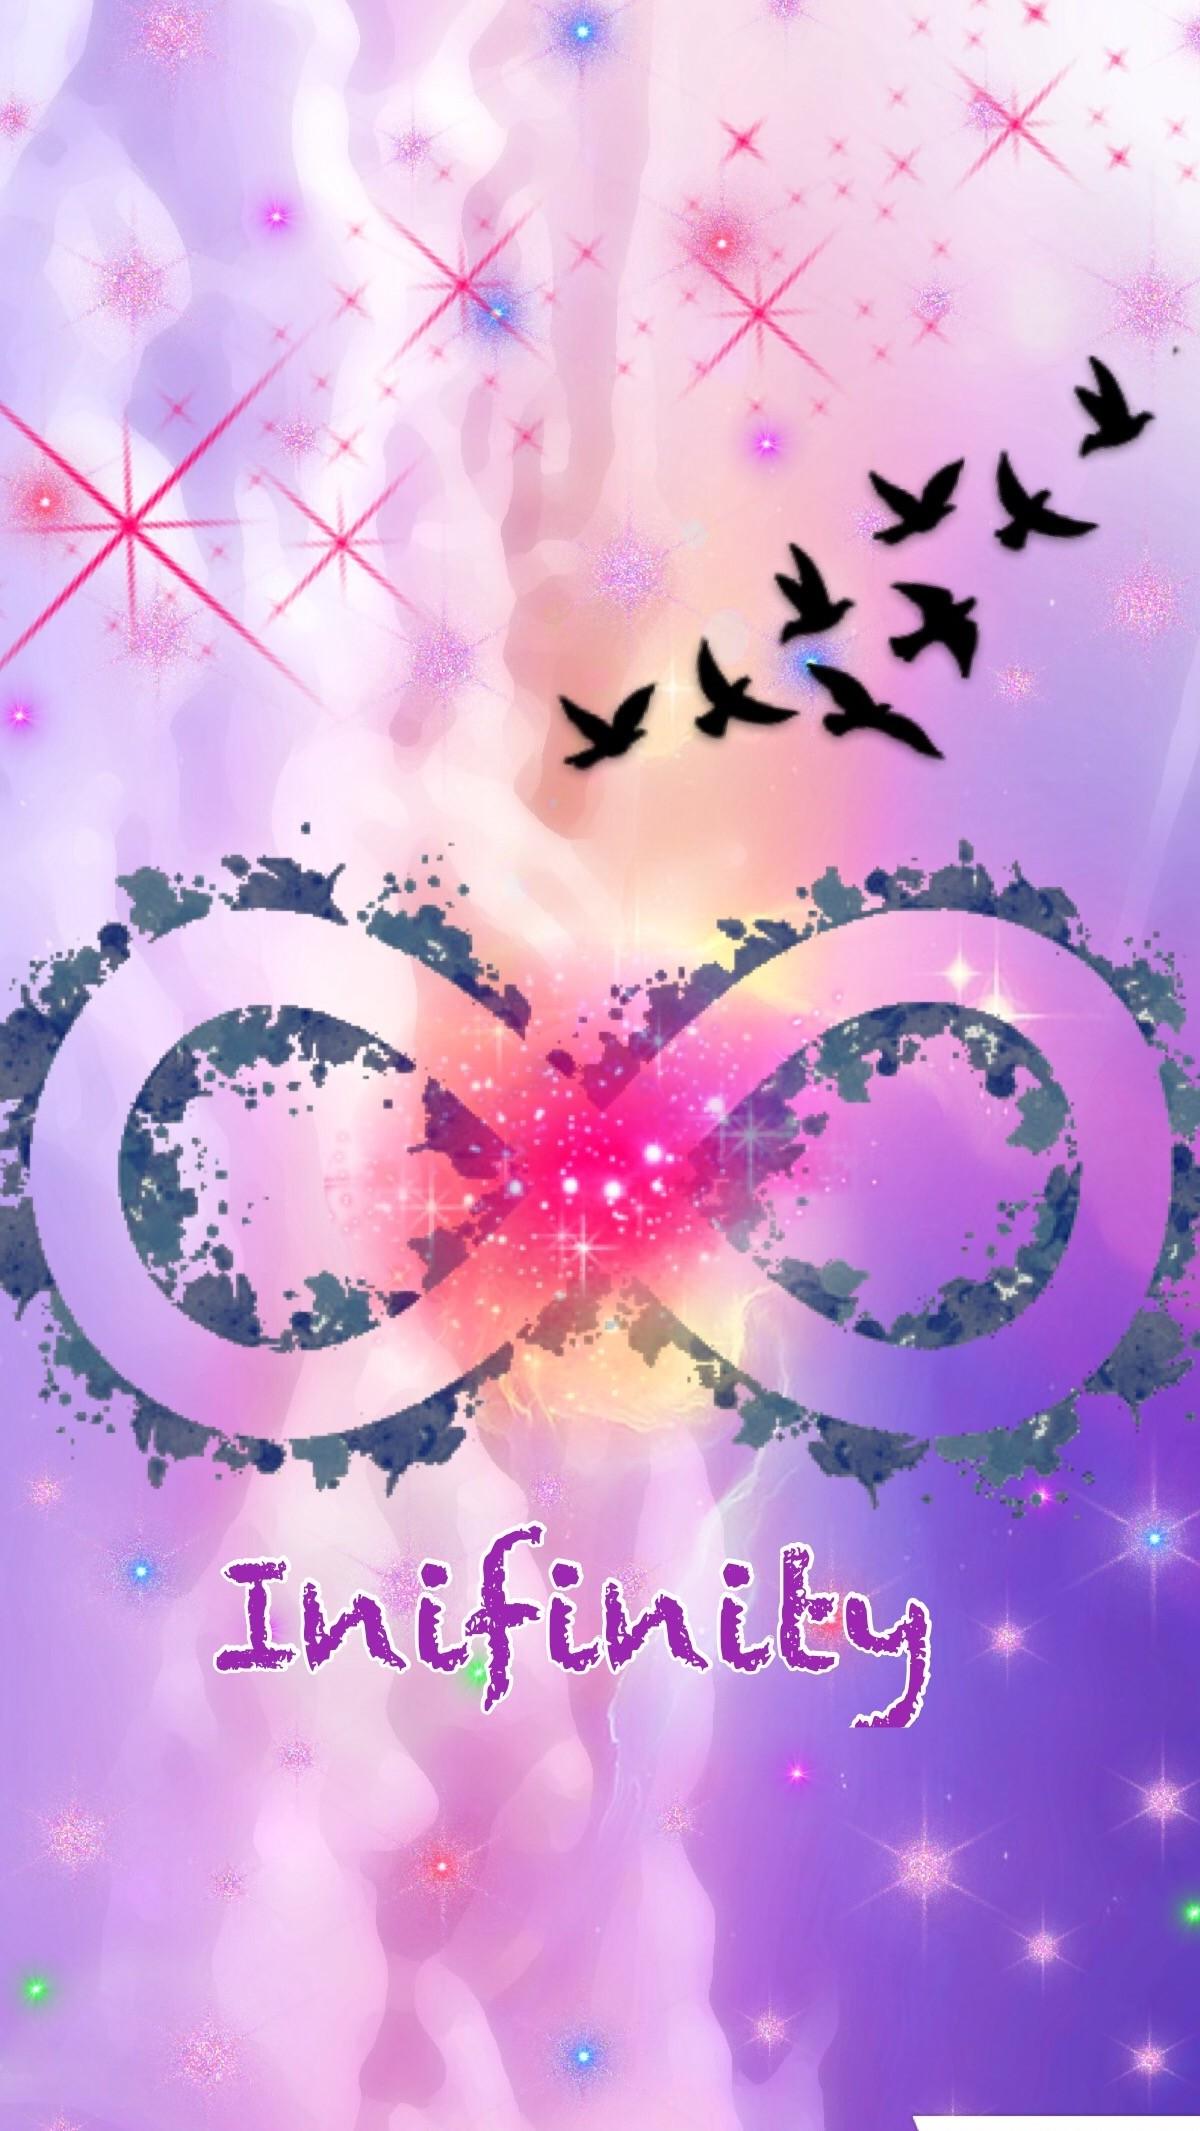 Cute girly infinity. Wallpaper …